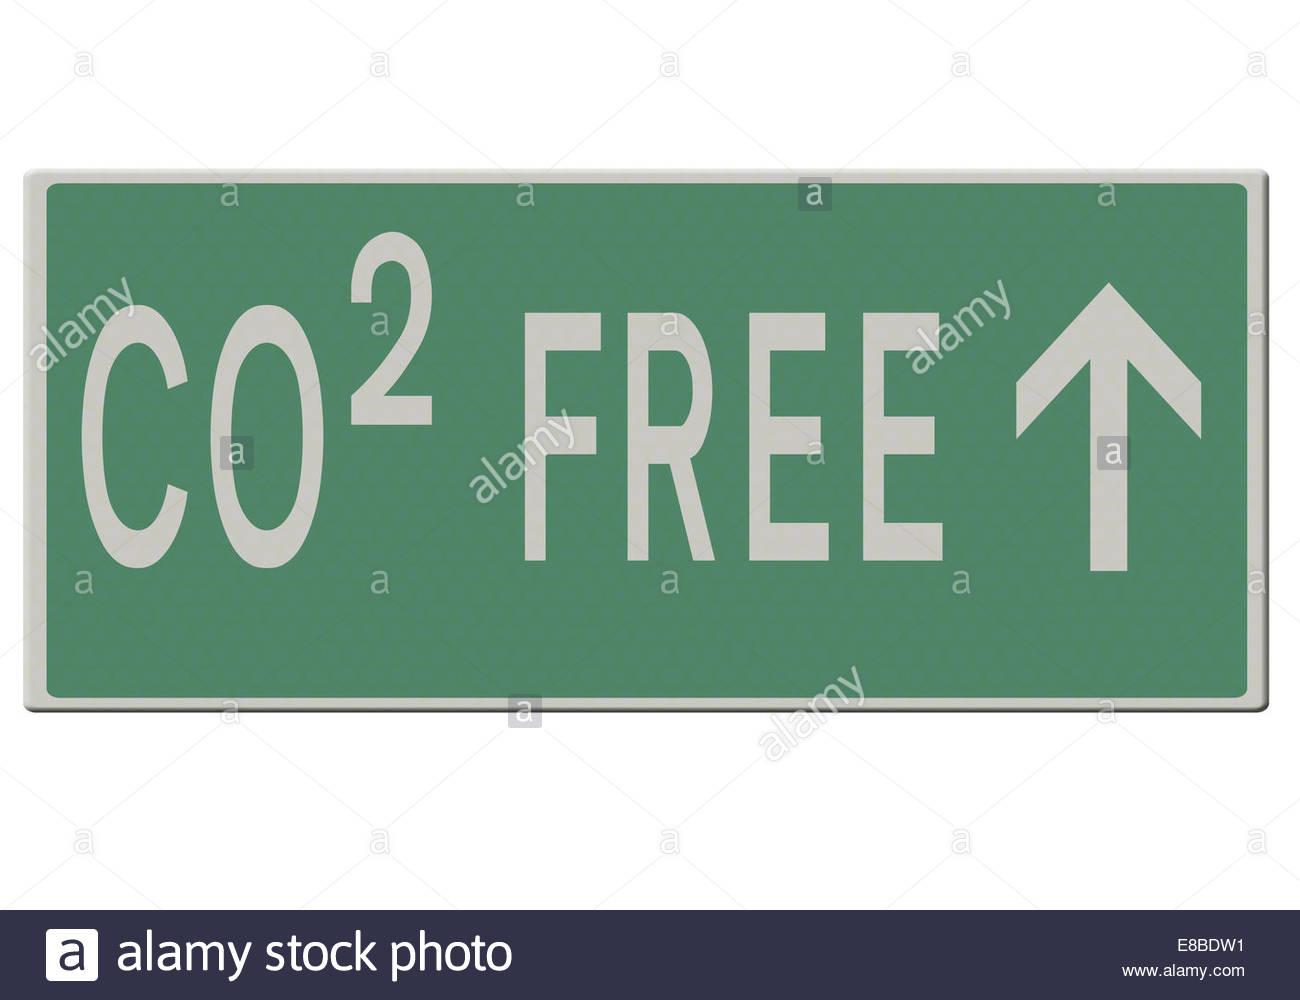 Digital illustration - Road sign - Co2 free future. - Stock Image